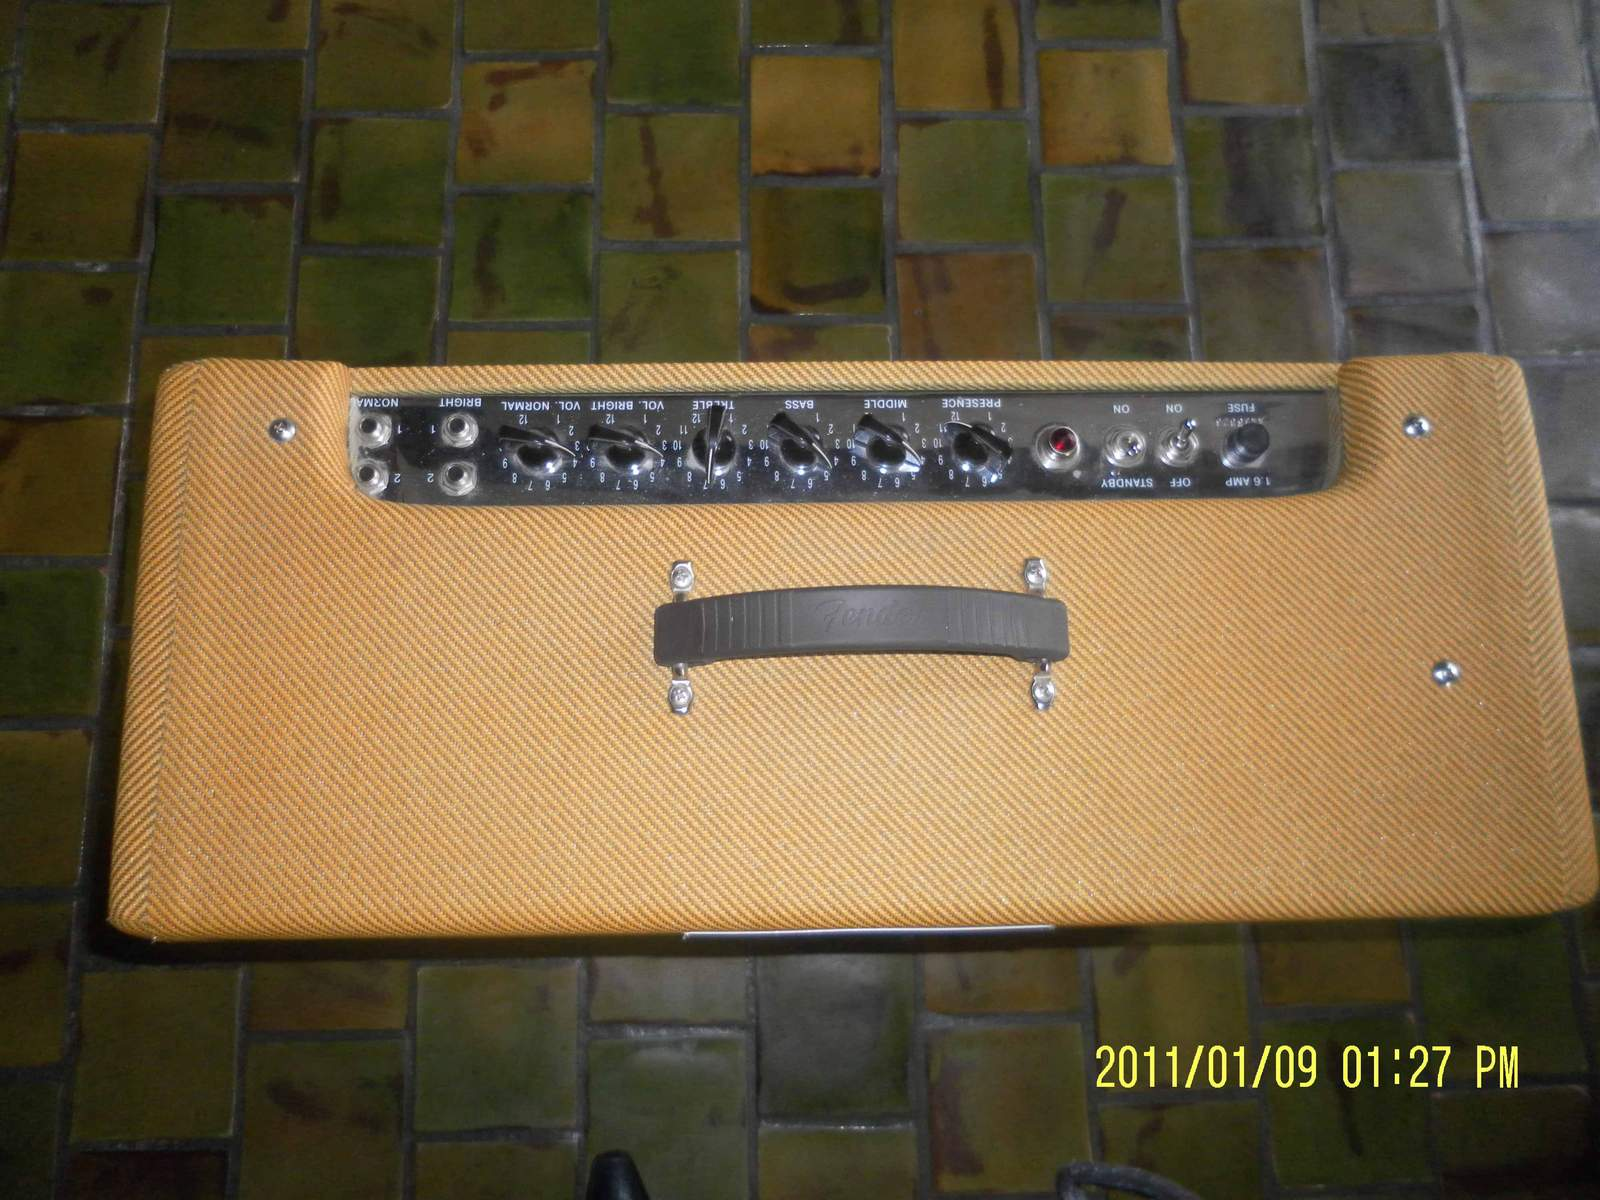 fender vintage reissue 39 59 bassman ltd image 173799 audiofanzine. Black Bedroom Furniture Sets. Home Design Ideas